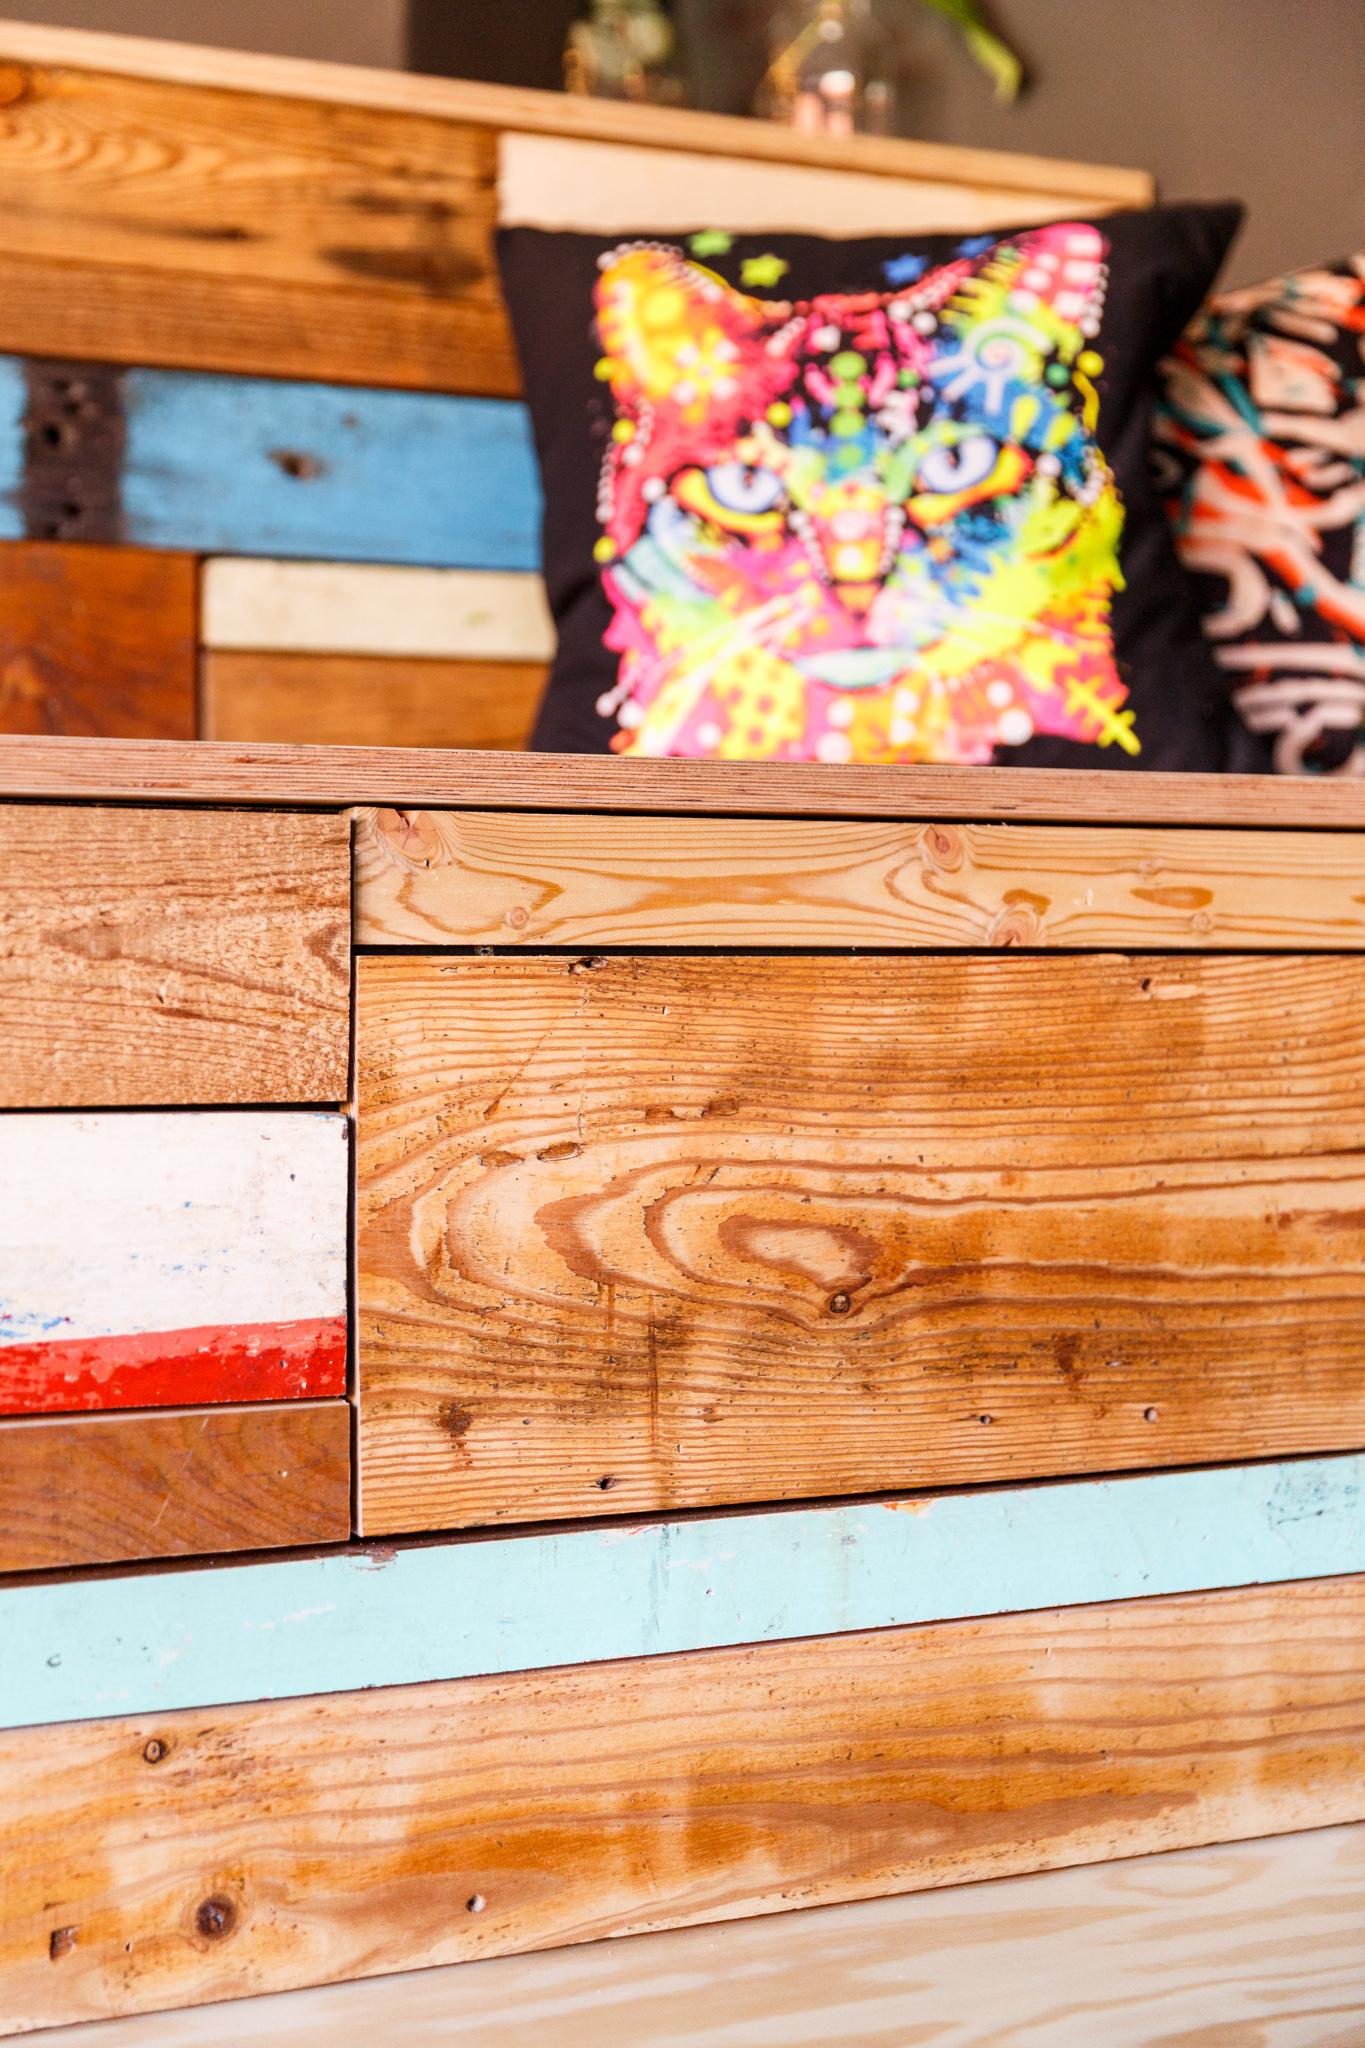 PeakAce-Konferenzraum-Kater Blau-Detail-Dittmarandfriends.jpg